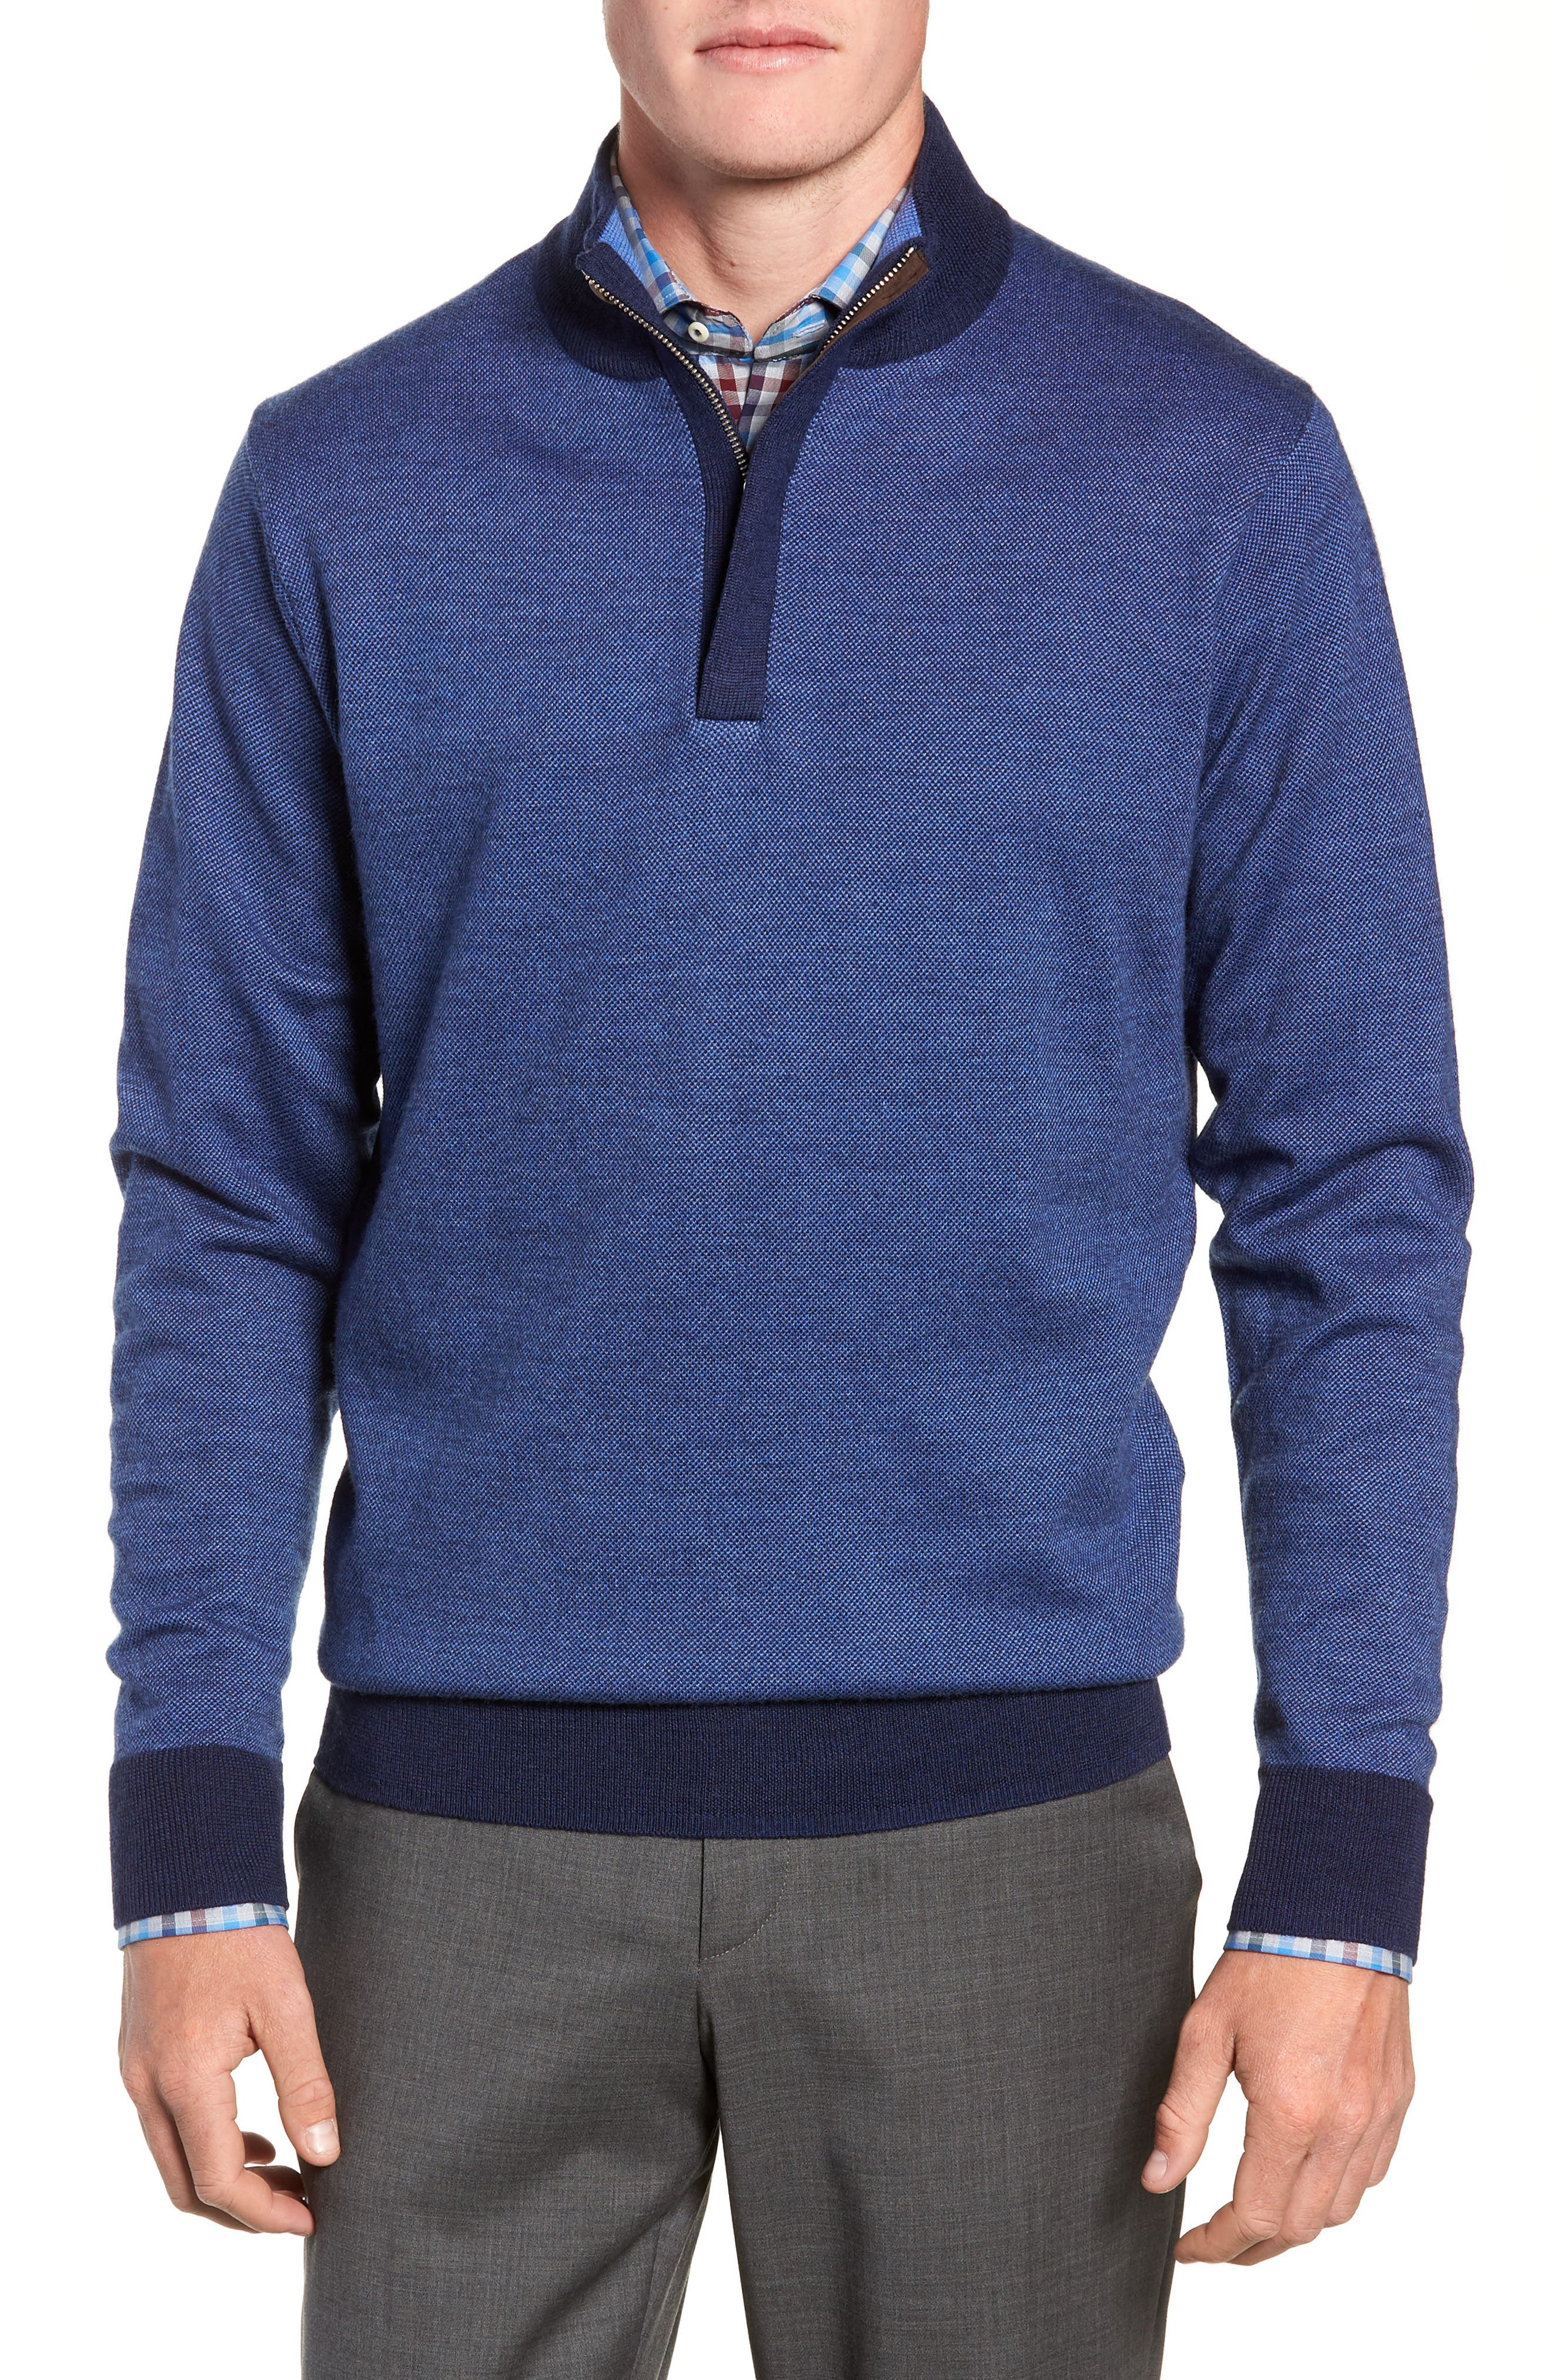 Birdseye Merino Wool Quarter Zip Sweater,                             Main thumbnail 1, color,                             PLAZA BLUE